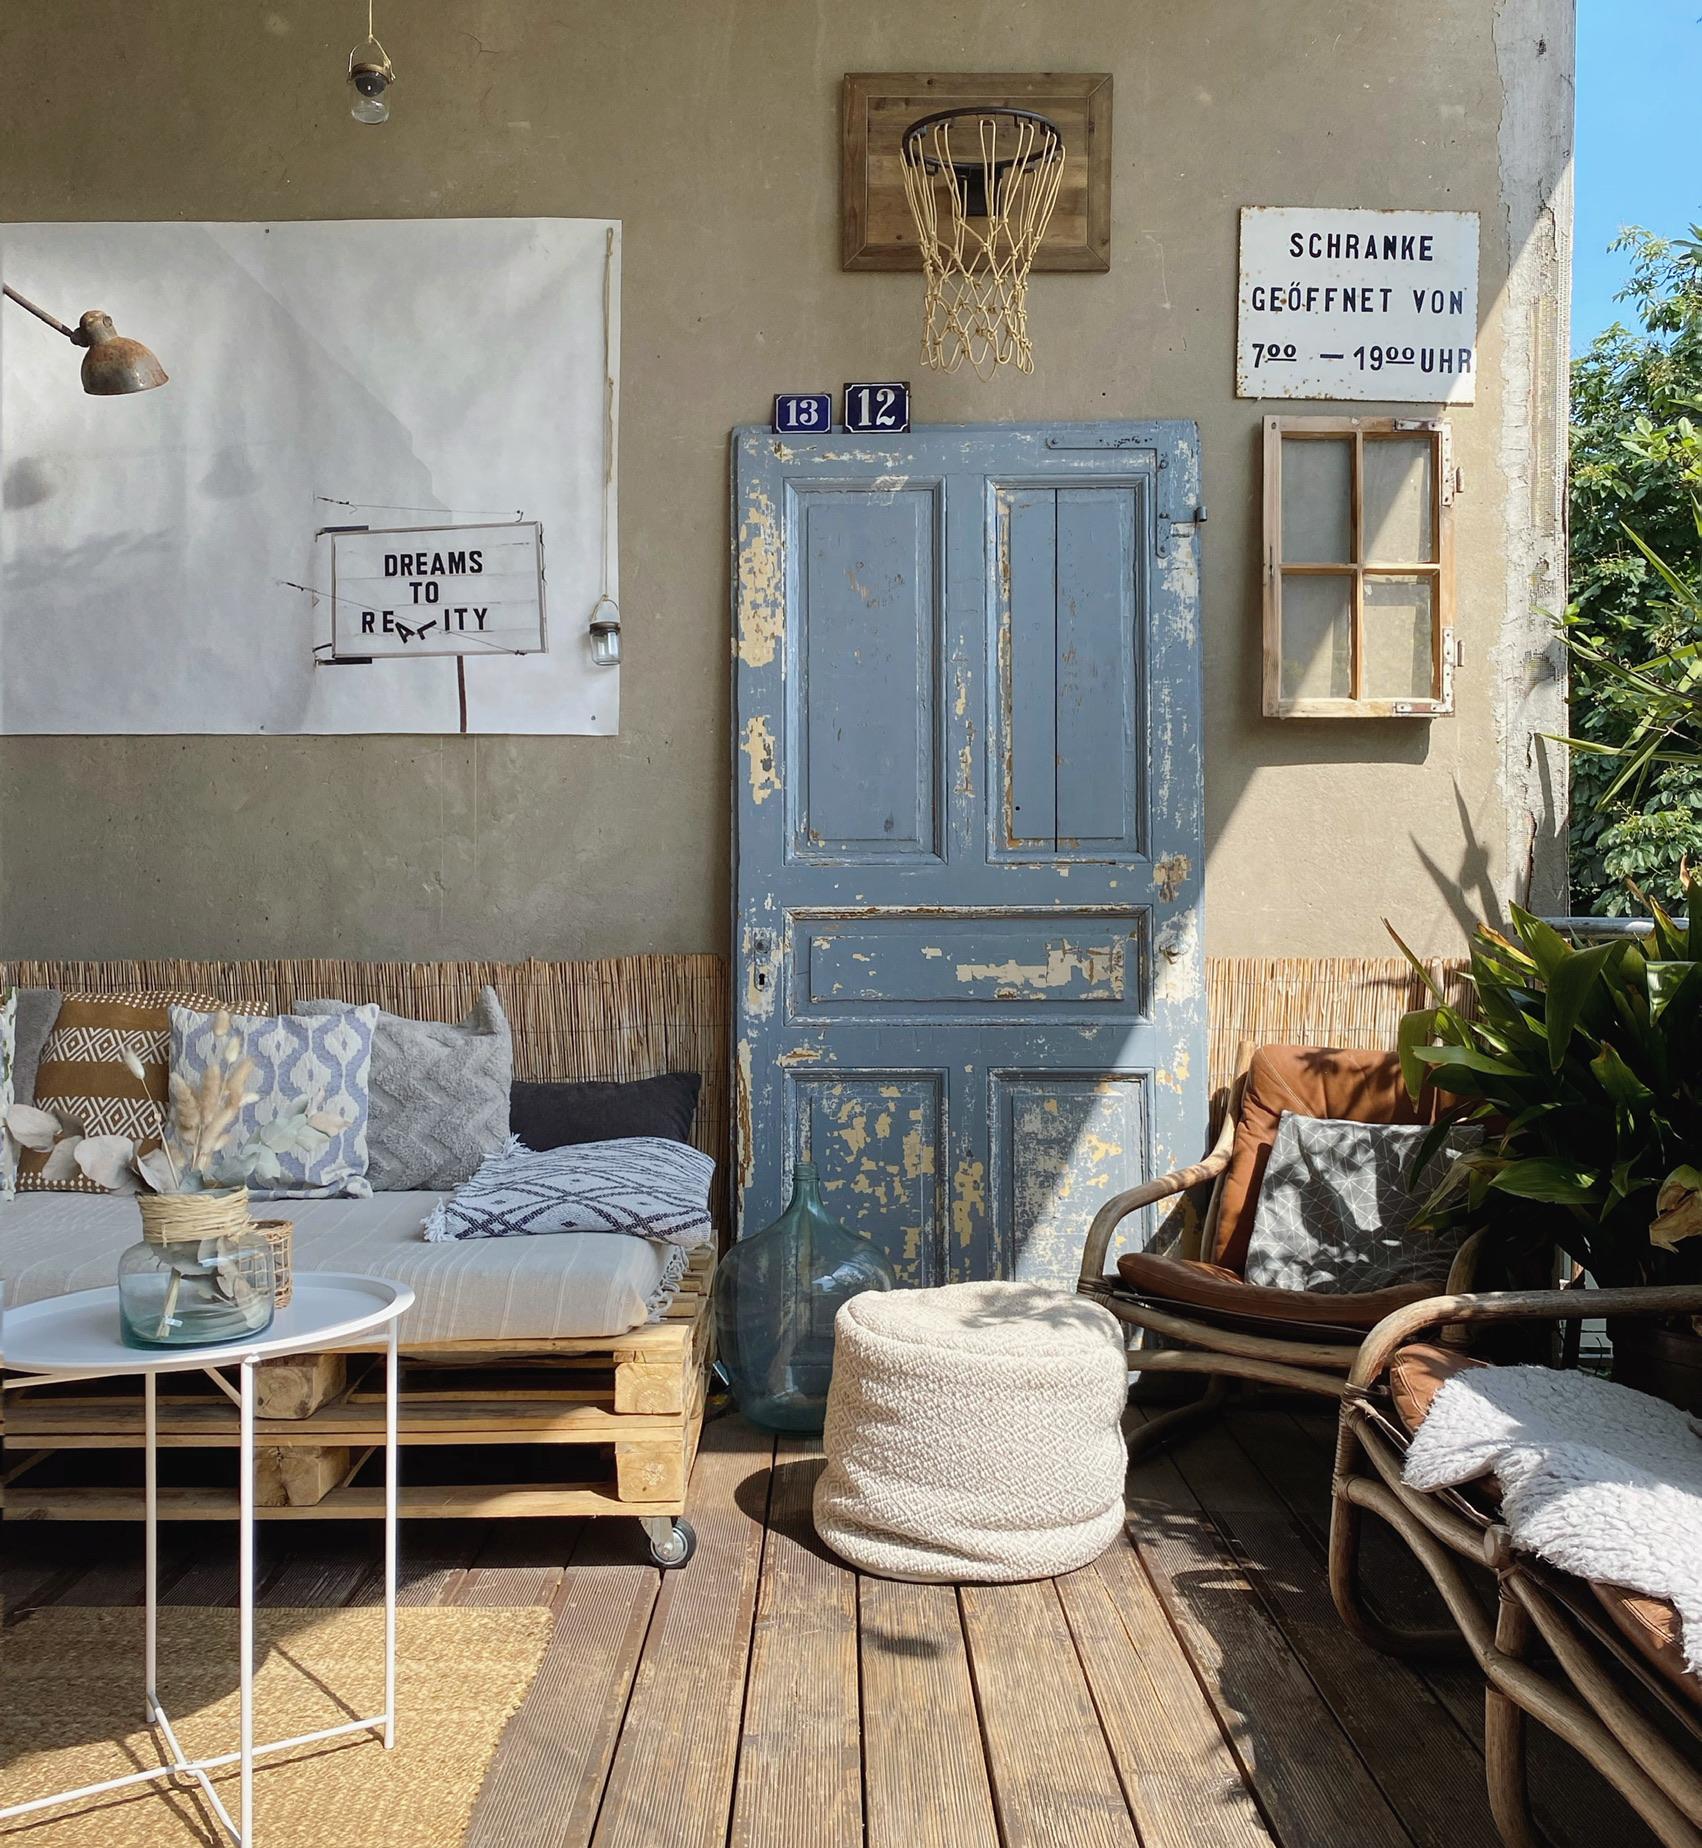 DIY Palettenmöbel am Balkon